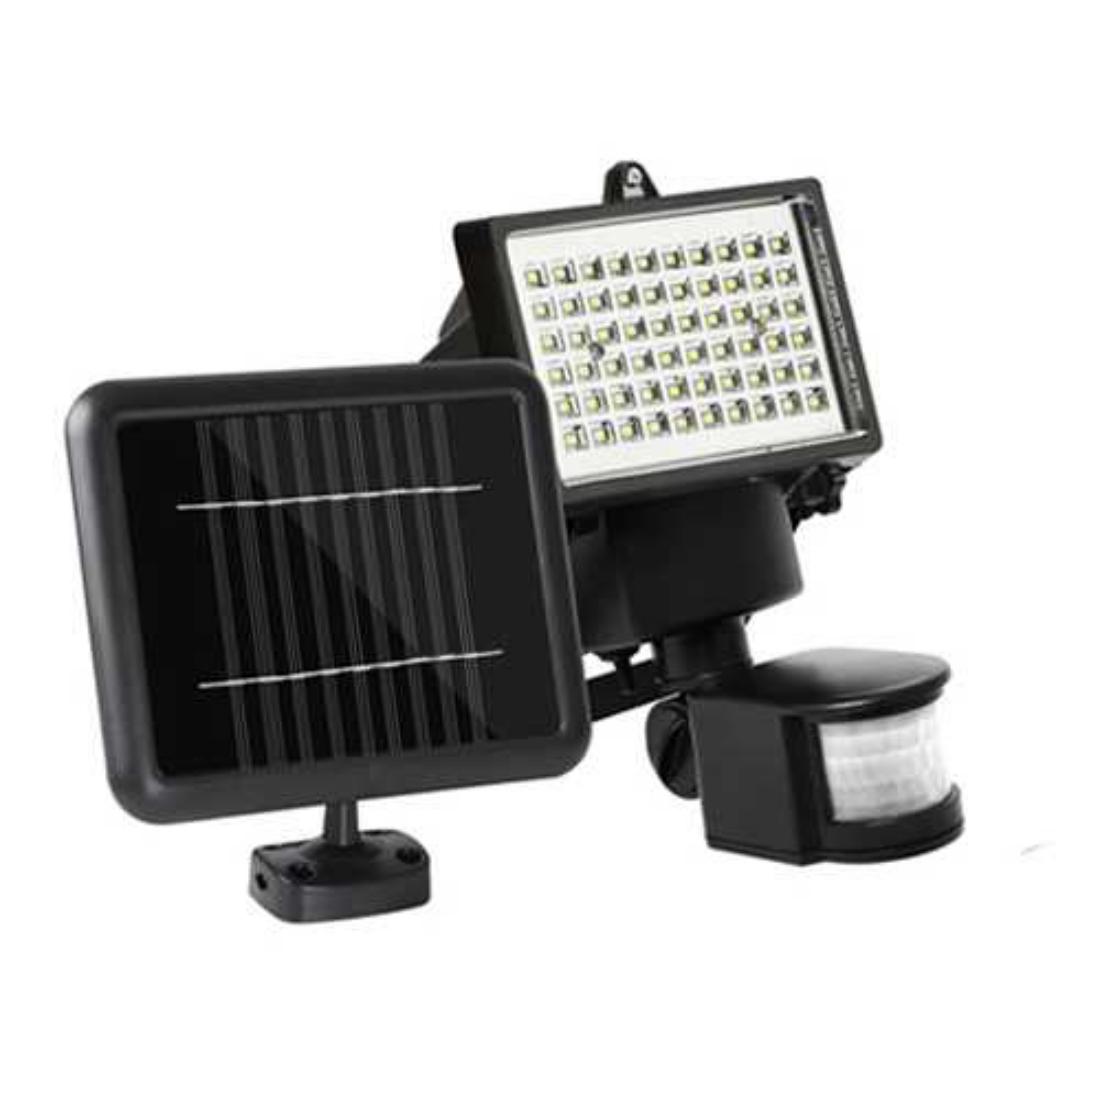 60 LED Solar Sensor Outdoor Light